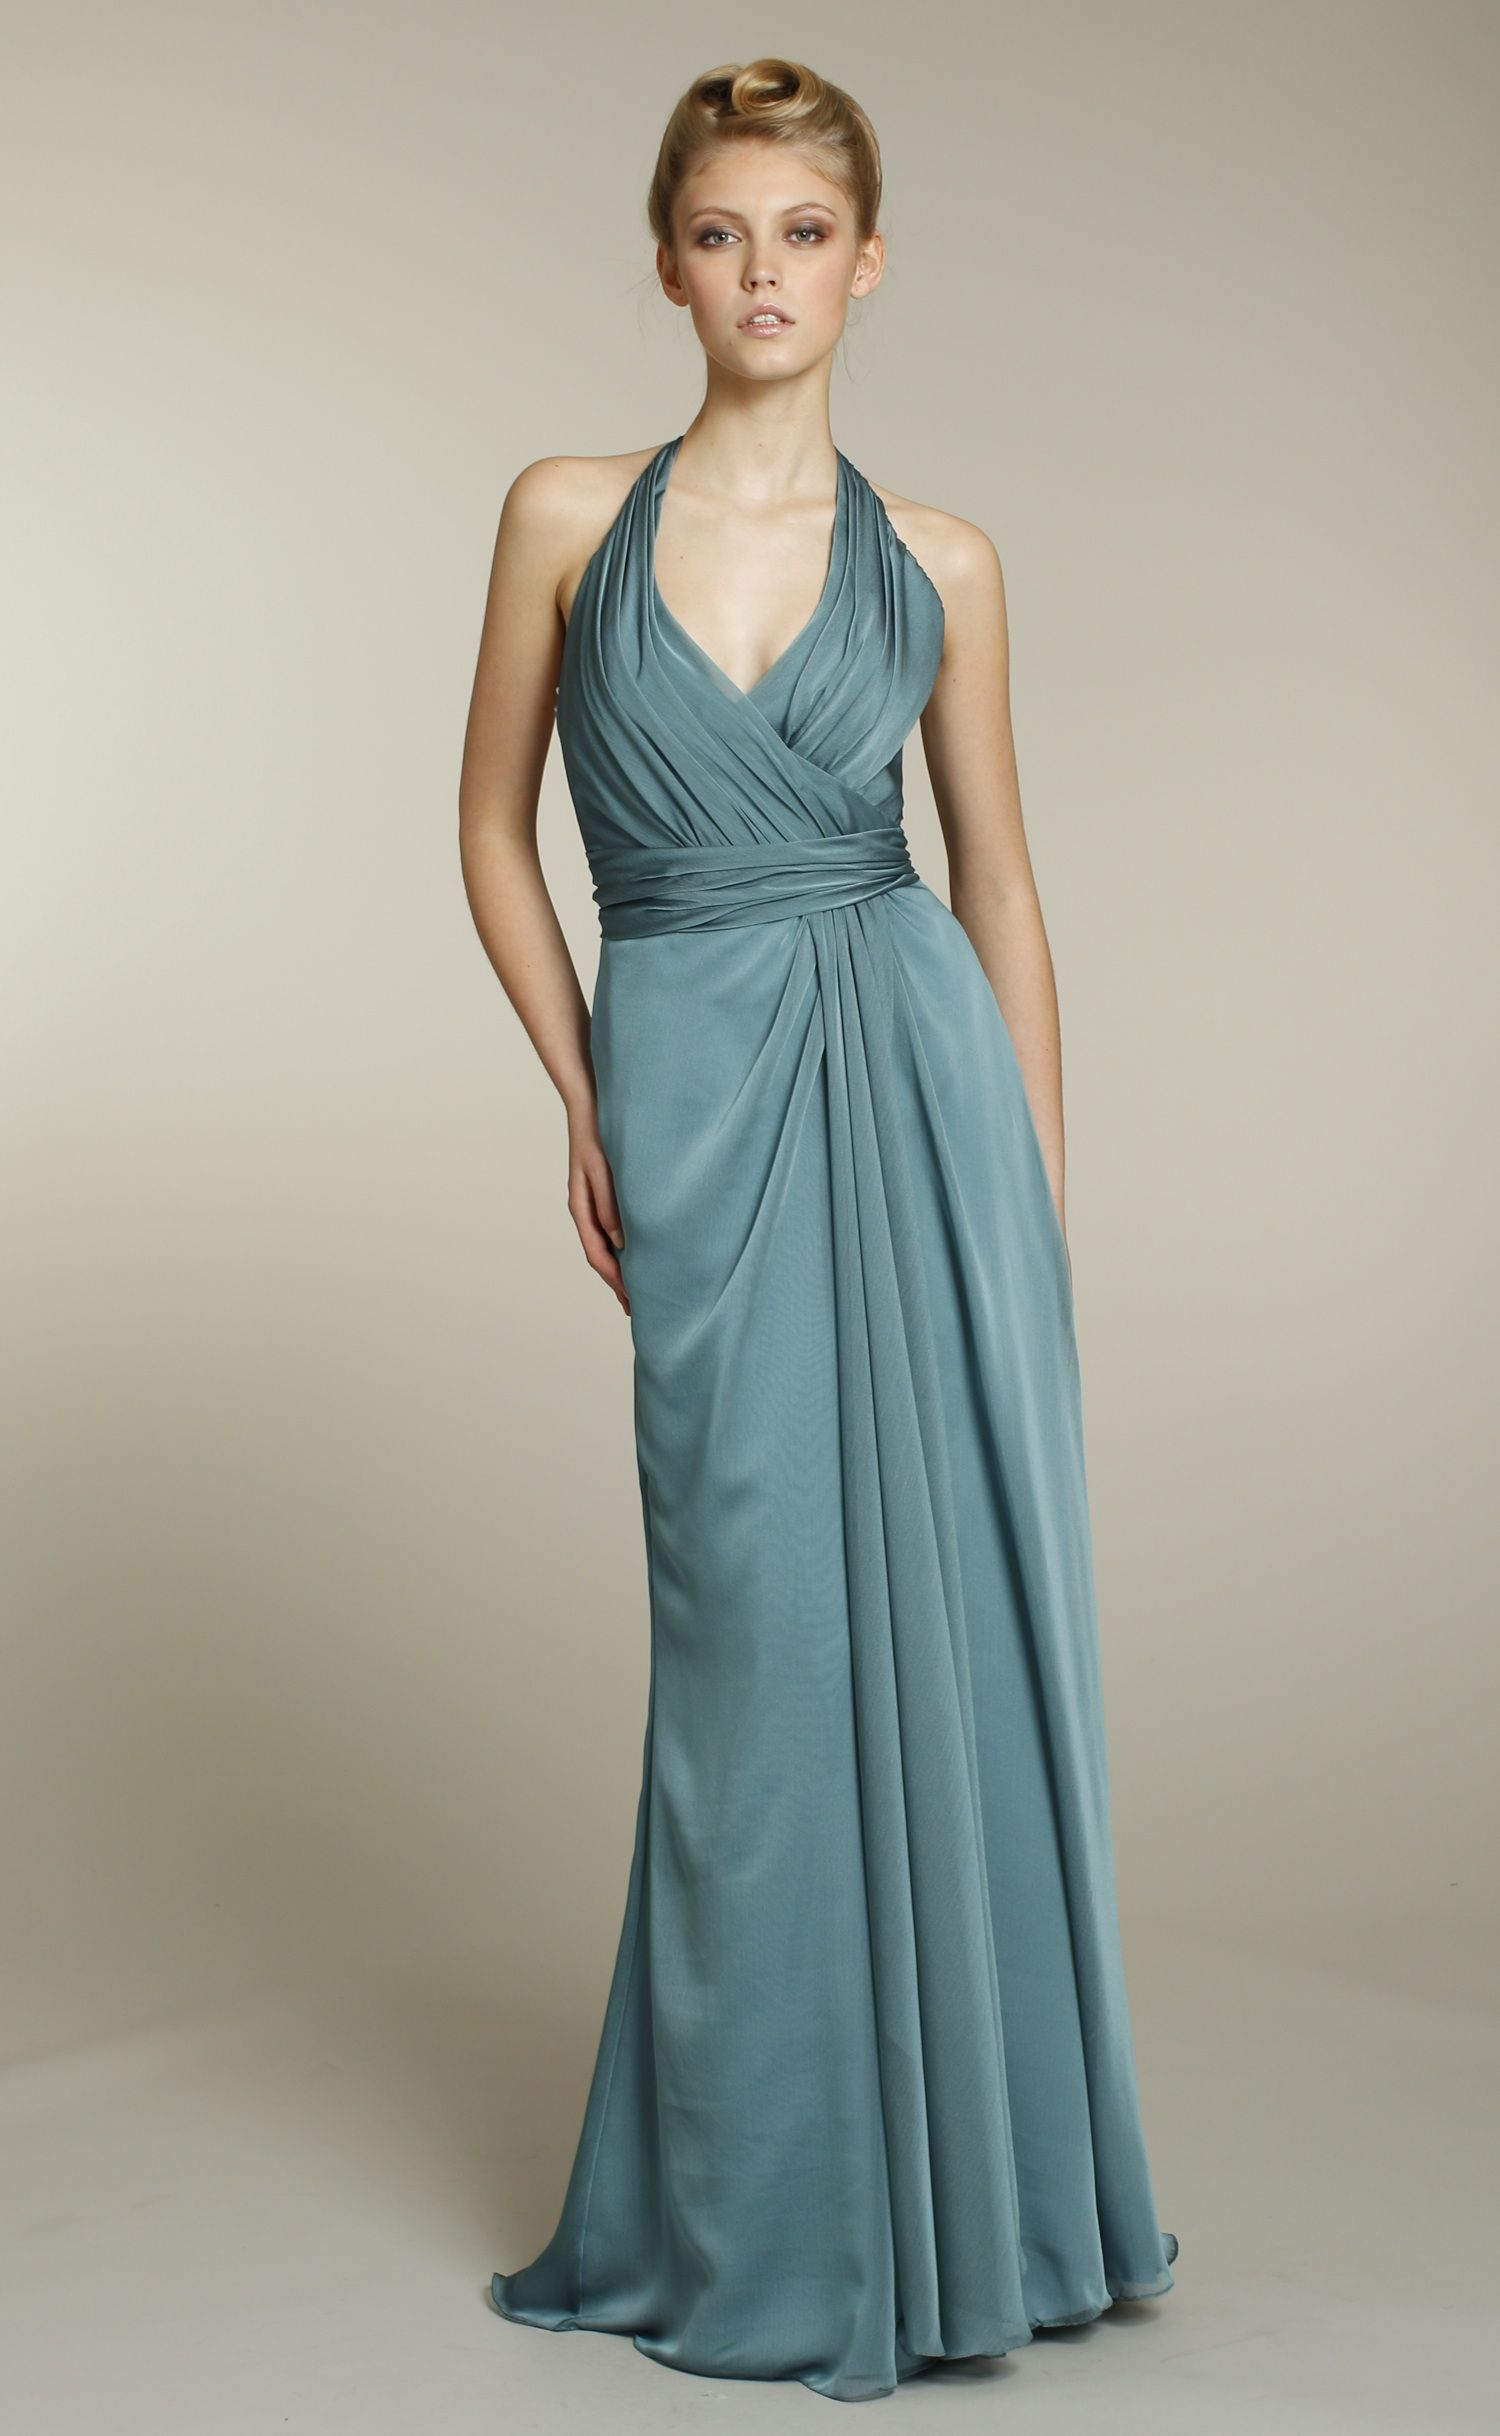 bridesmaids-dress-formal-long-teal-halter-neckline-lazaro-2011-5176 ...